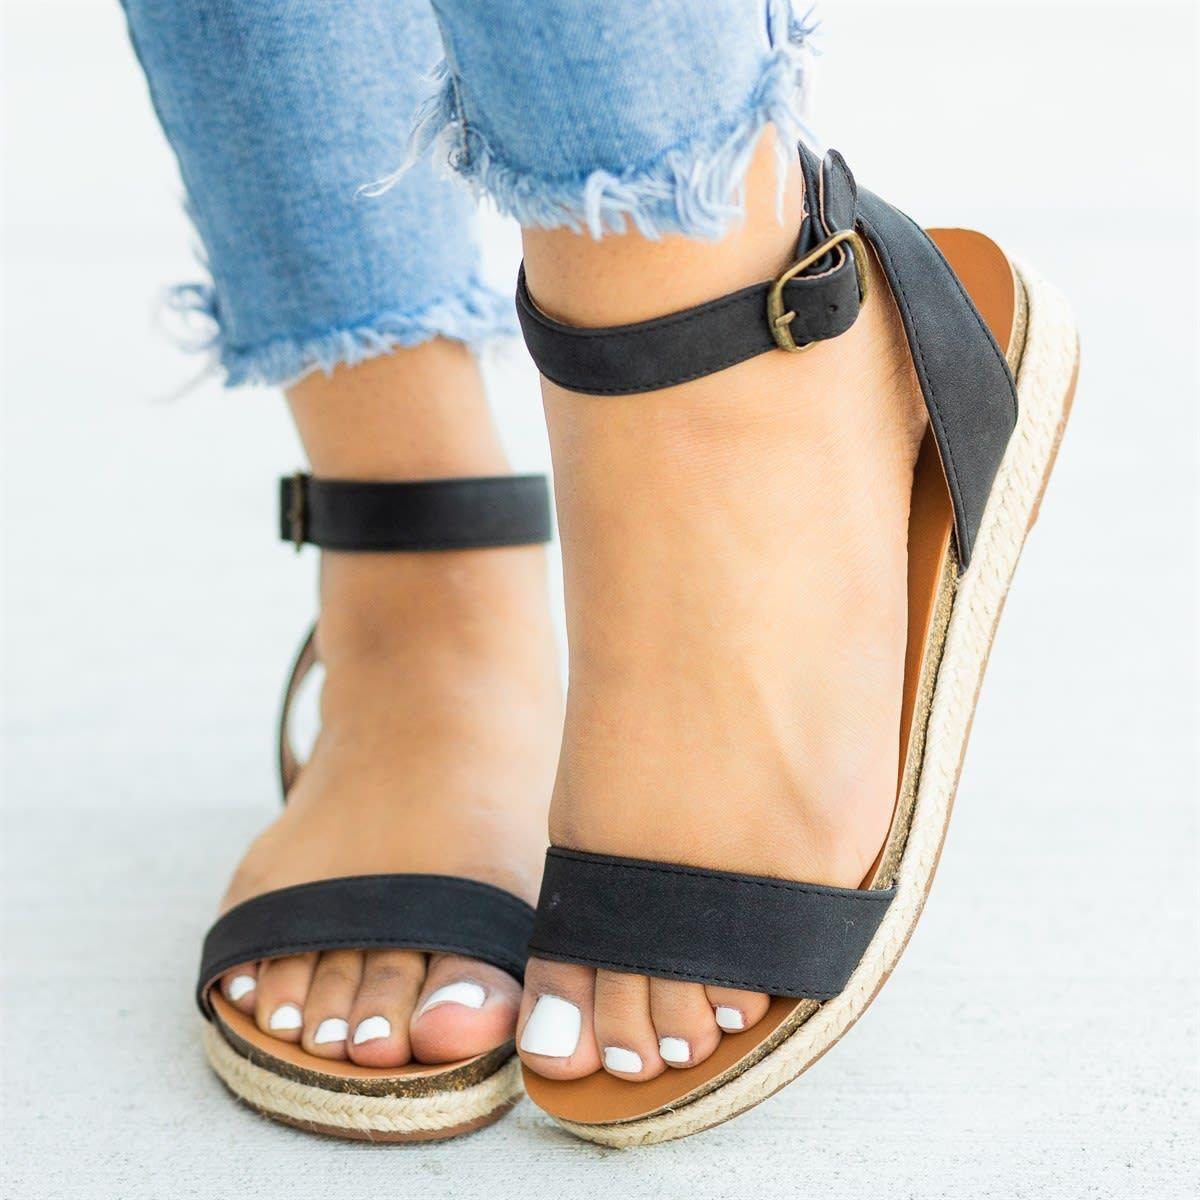 a2ec33250f8 holilychic Women s Shoes Casual Open Toe Platform Adjustable Buckle Orange  Women s Shoes – Holilychic